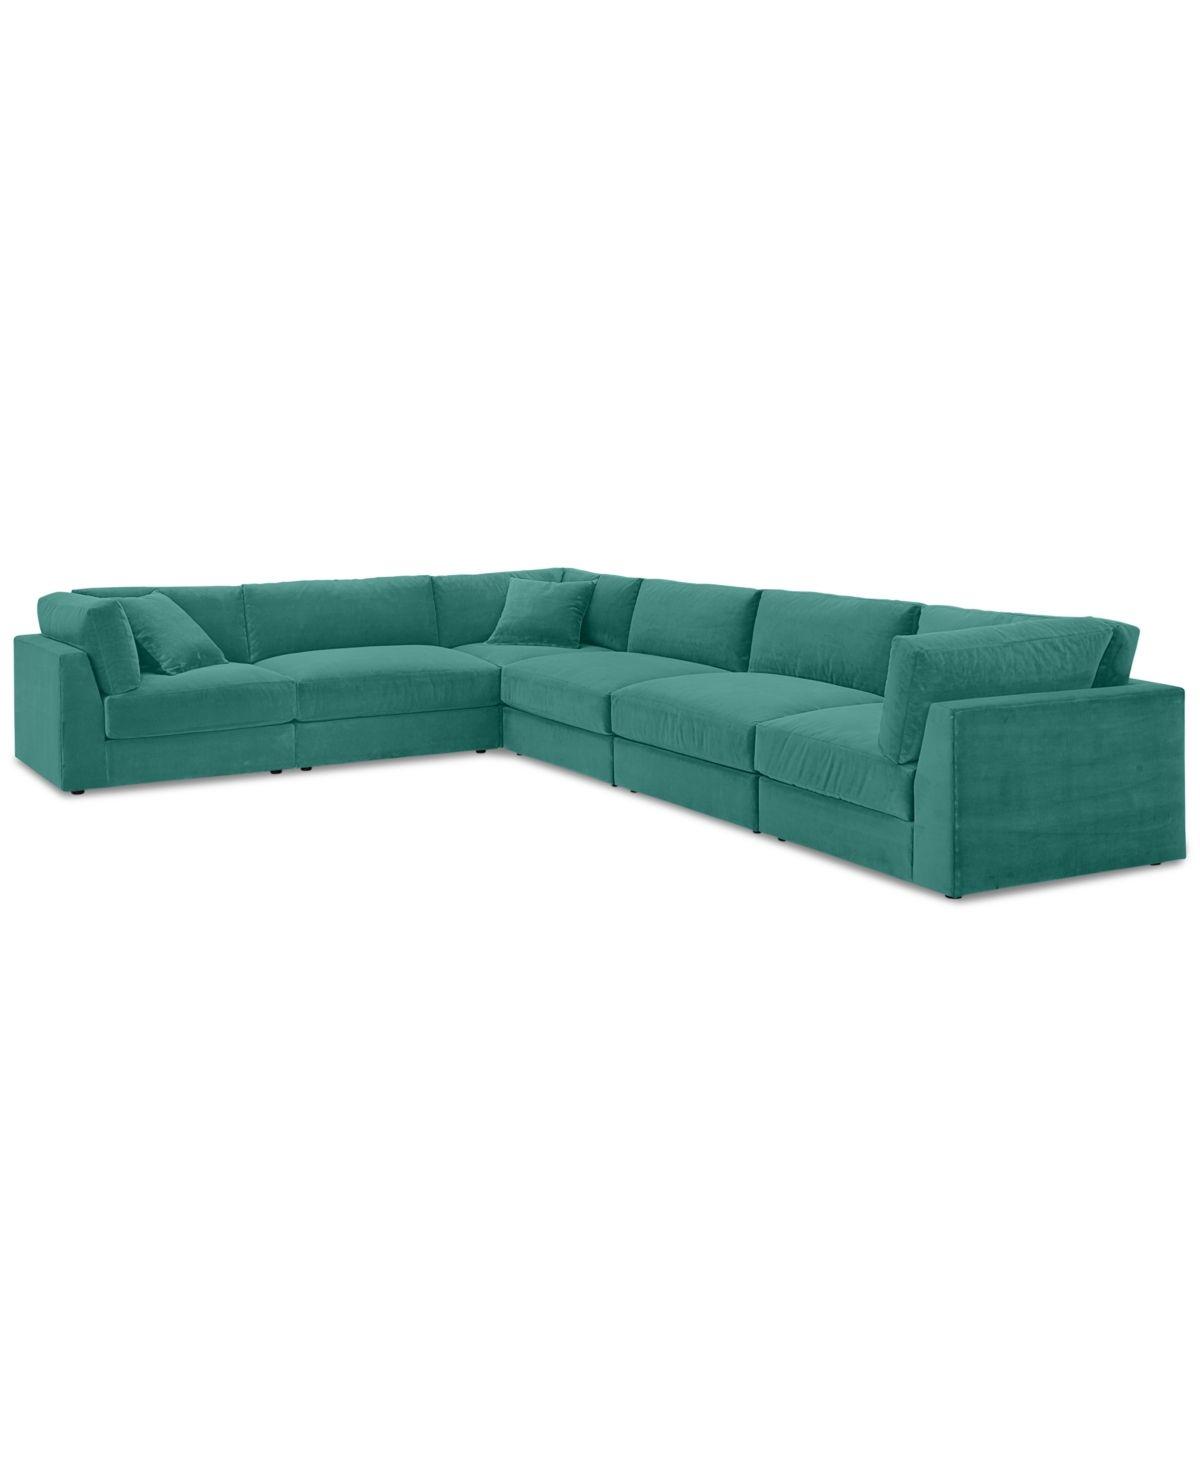 Best Aryanna 6 Pc L Modular Sofa Created For Macy S Bella 400 x 300